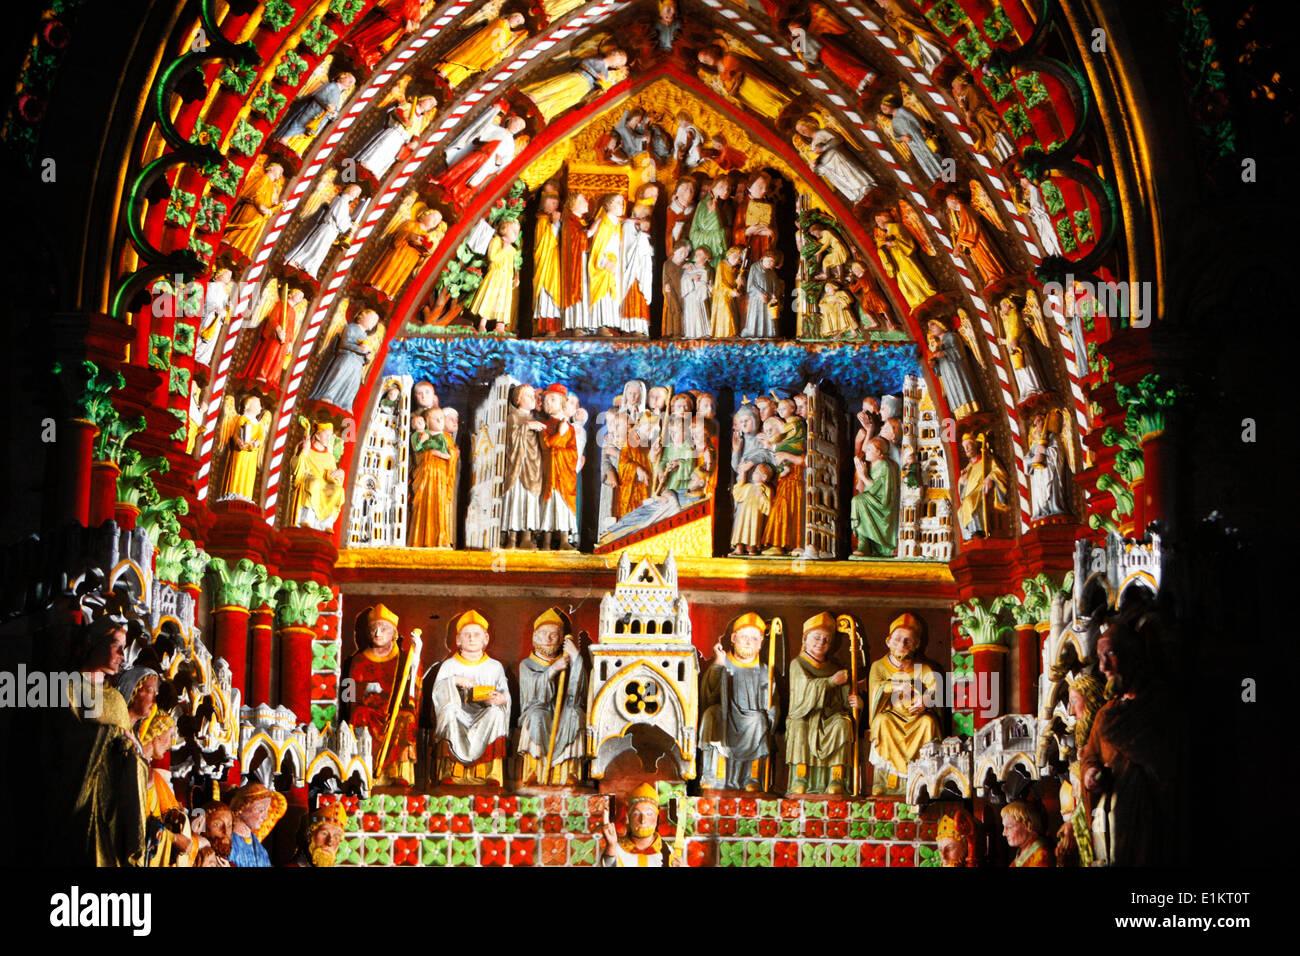 Amiens Kathedrale Beleuchtung Stockbild